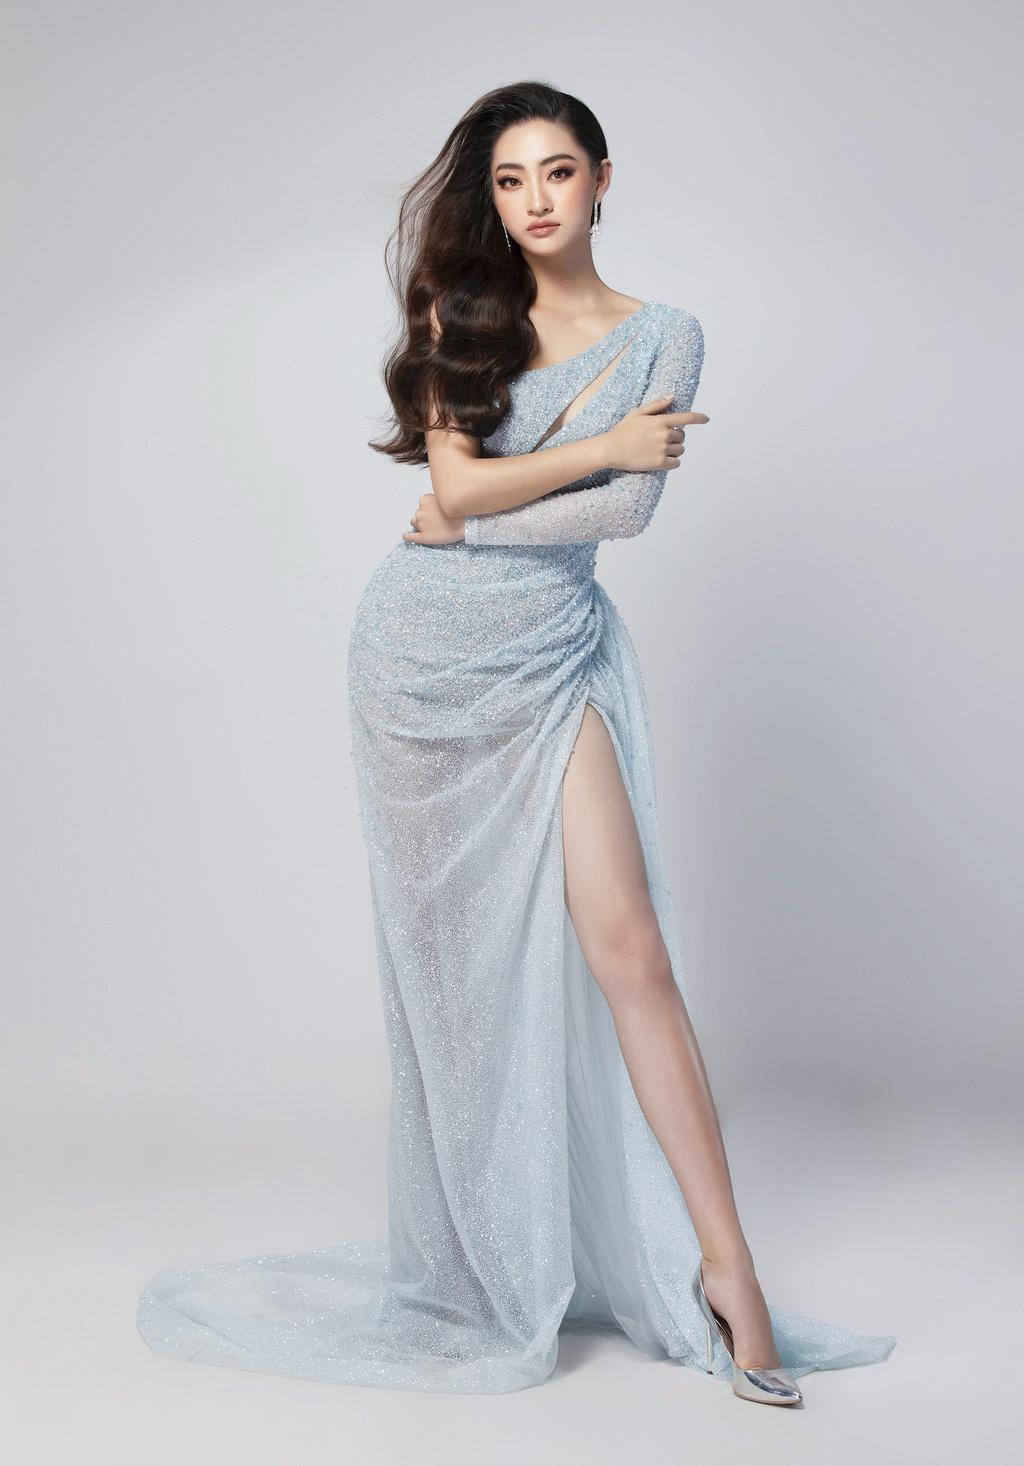 Luong Thuy Linh mac vay xe cao khoe chan 1,22 m o chung ket Miss World hinh anh 5 null